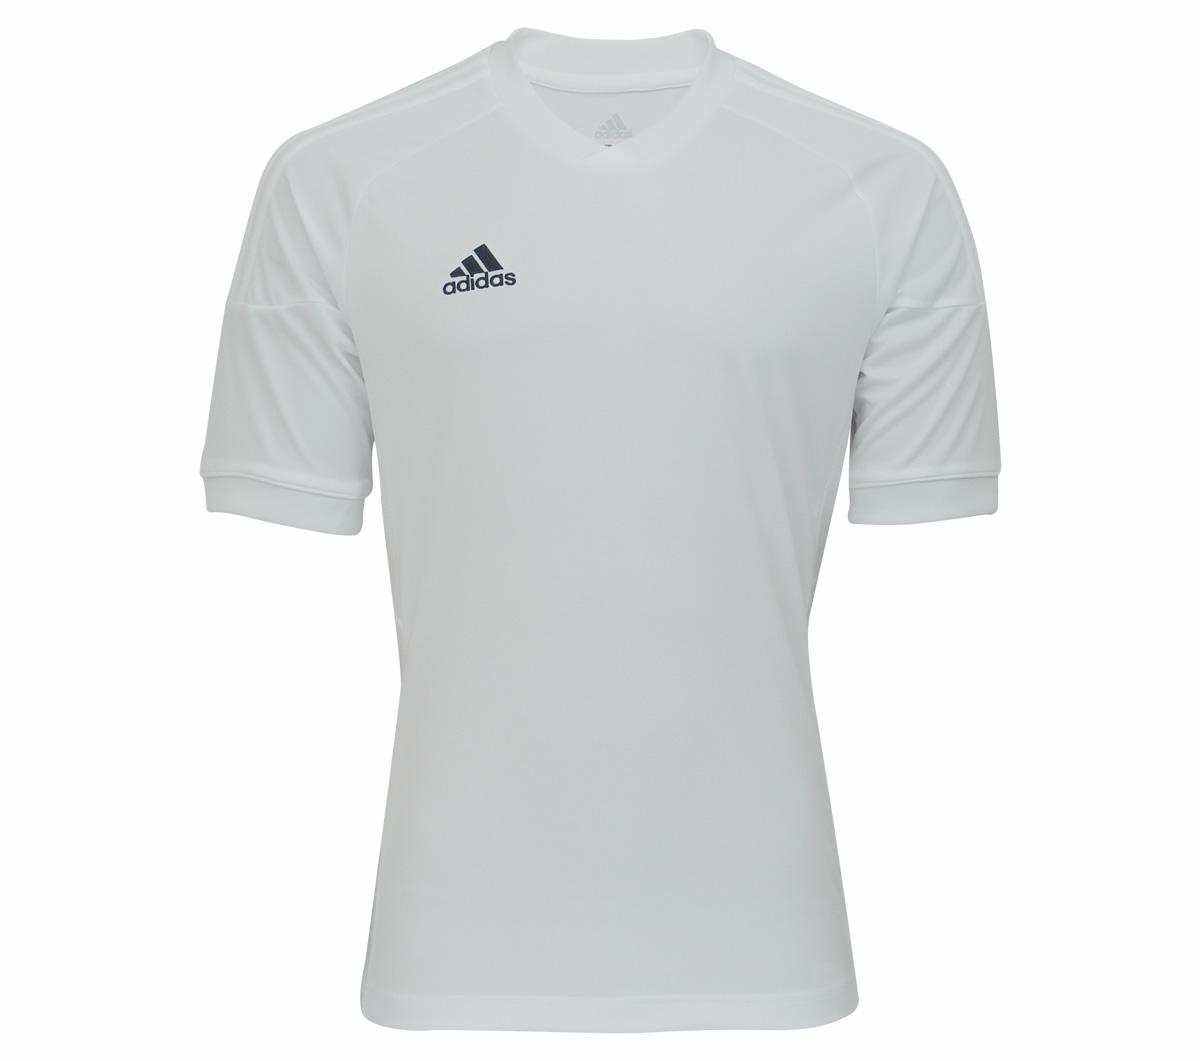 Camisa Adidas Regista 12 Branca Camisa Adidas Regista 12 Branca ... cfc93a09fc01a